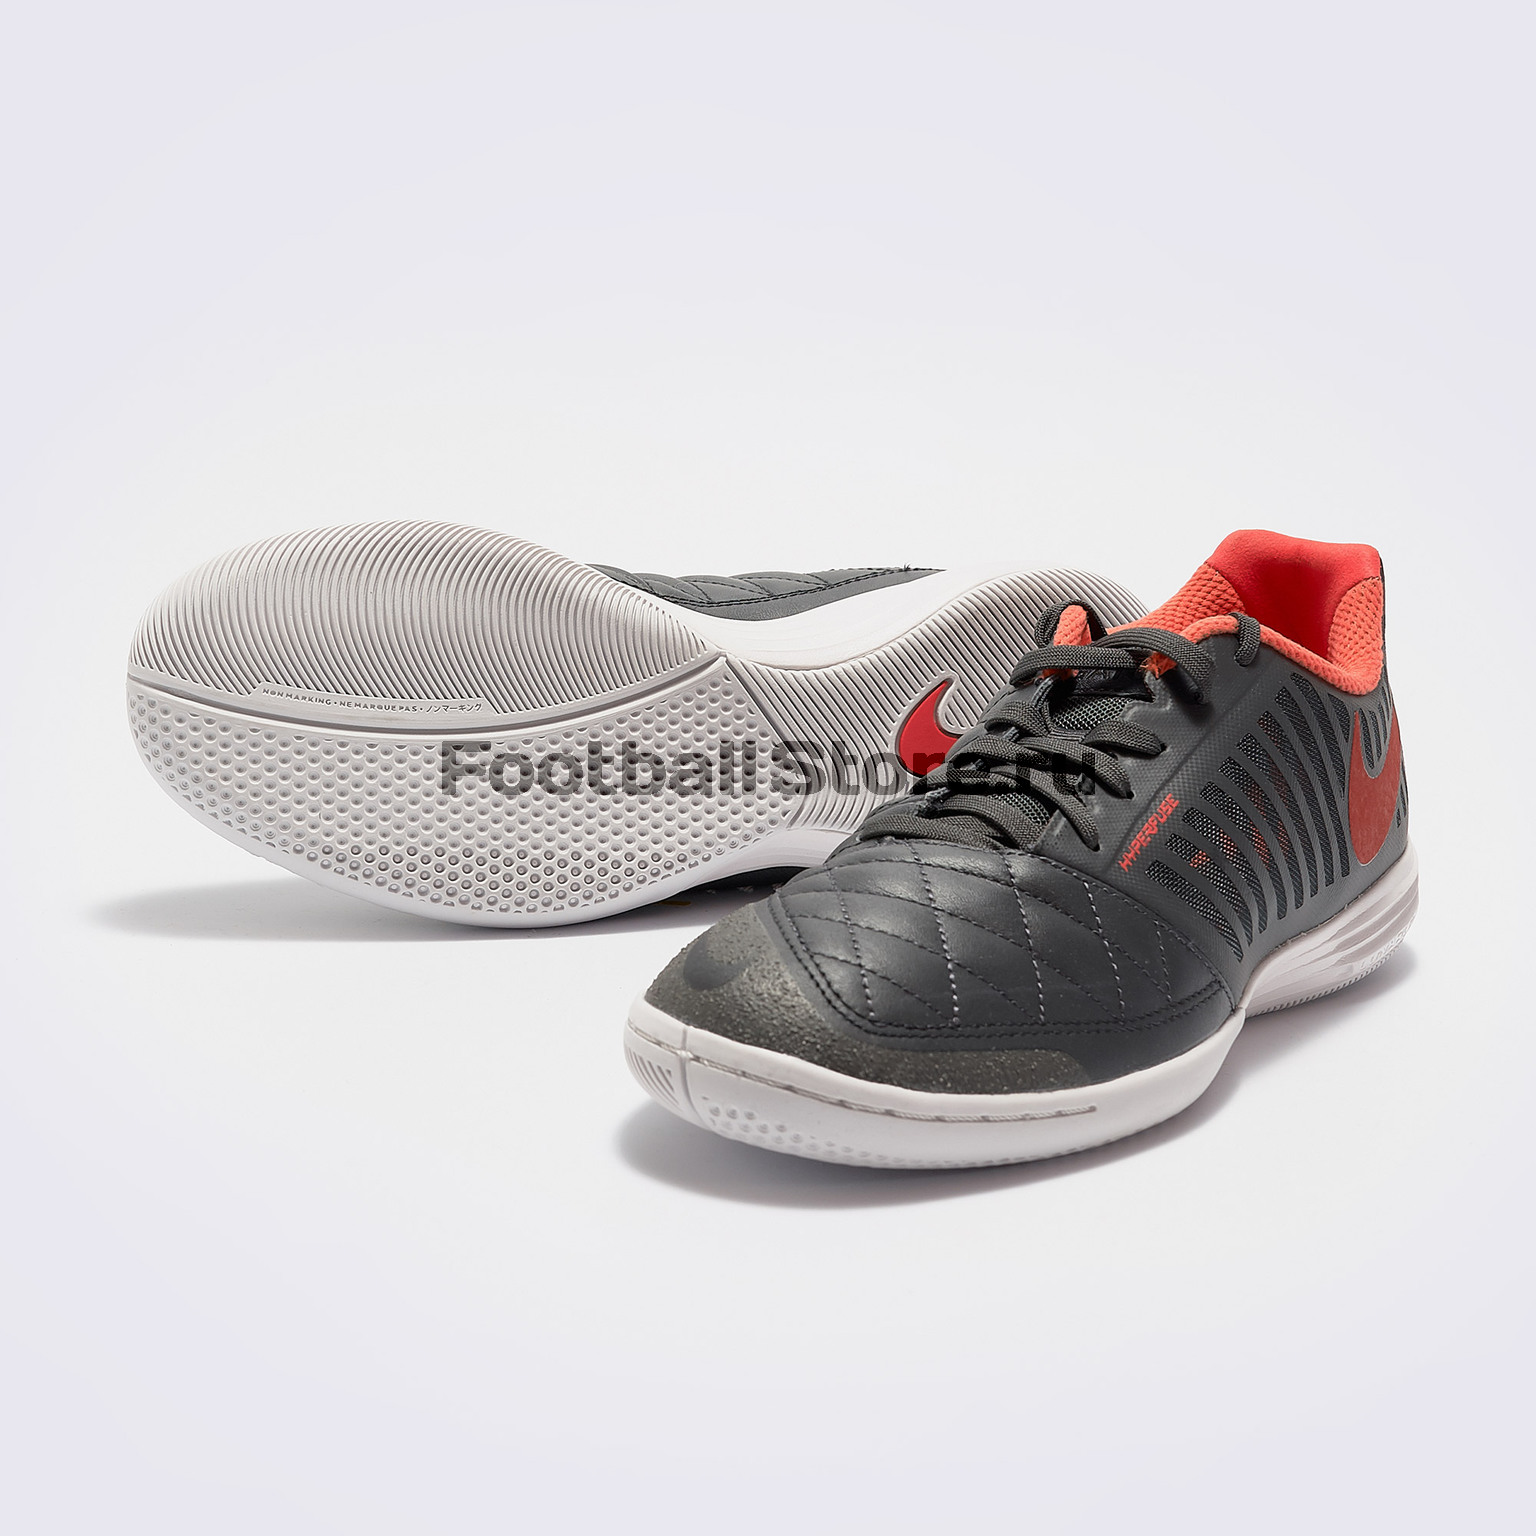 Футзалки Nike LunarGato II 580456-080 футзалки nike tiempo premier ii sala av3153 010